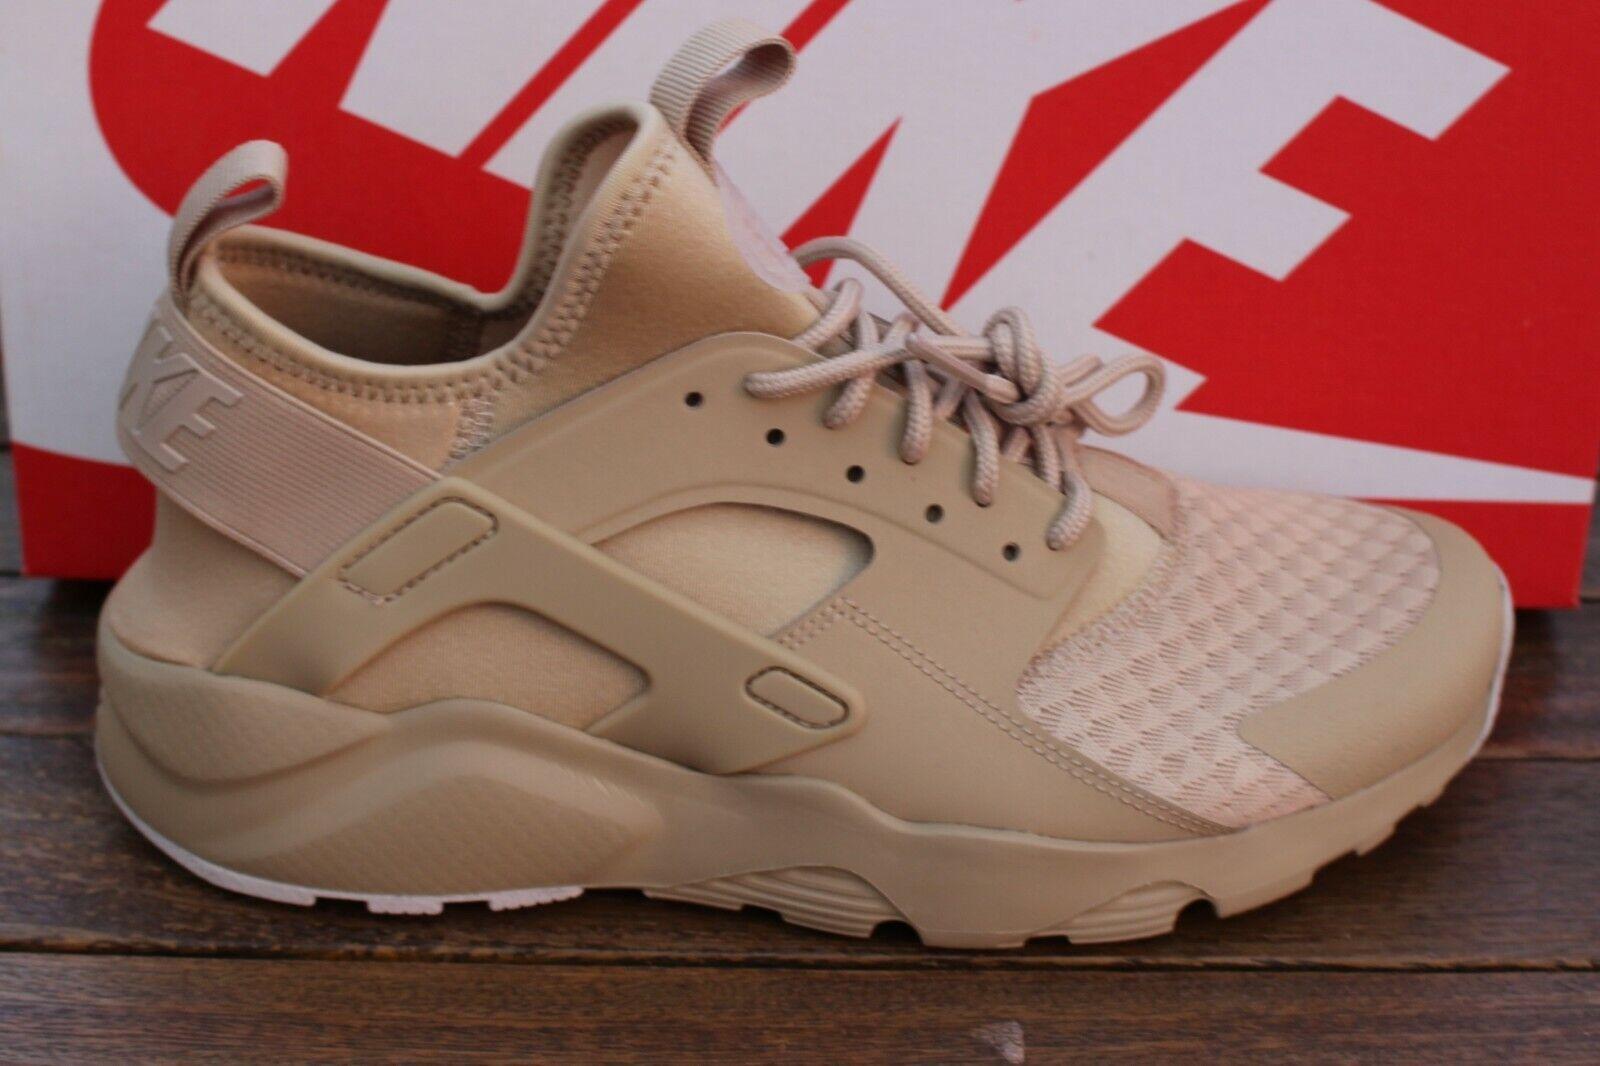 0dab5d1f2a714 Nike Air Huarache Run Ultra Mushroom Light Orewood Brown UK Size 8 ...